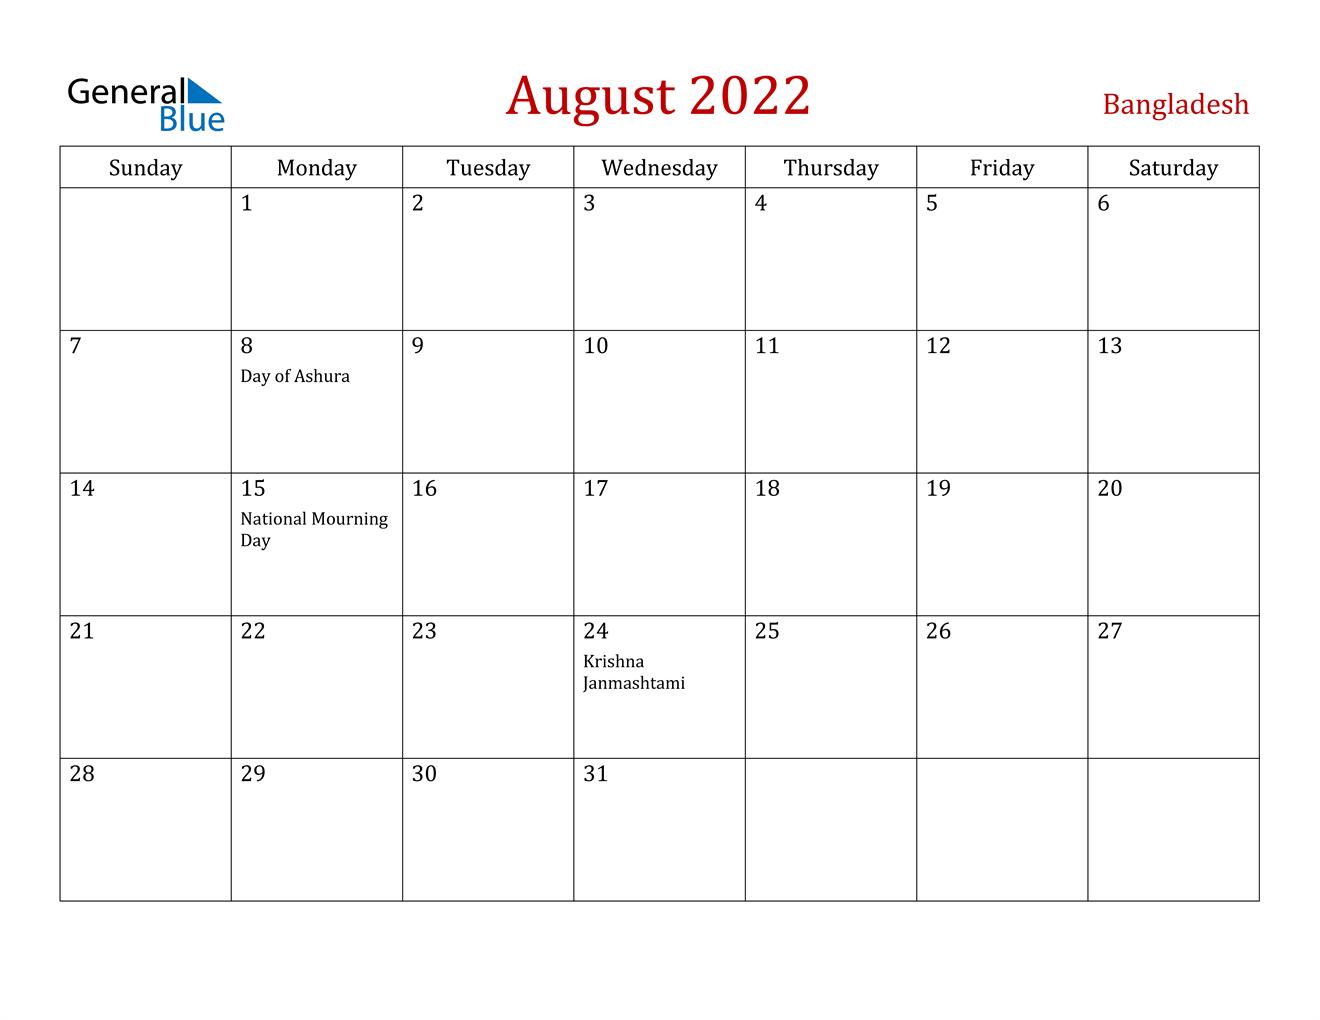 August 2022 Calendar - Bangladesh